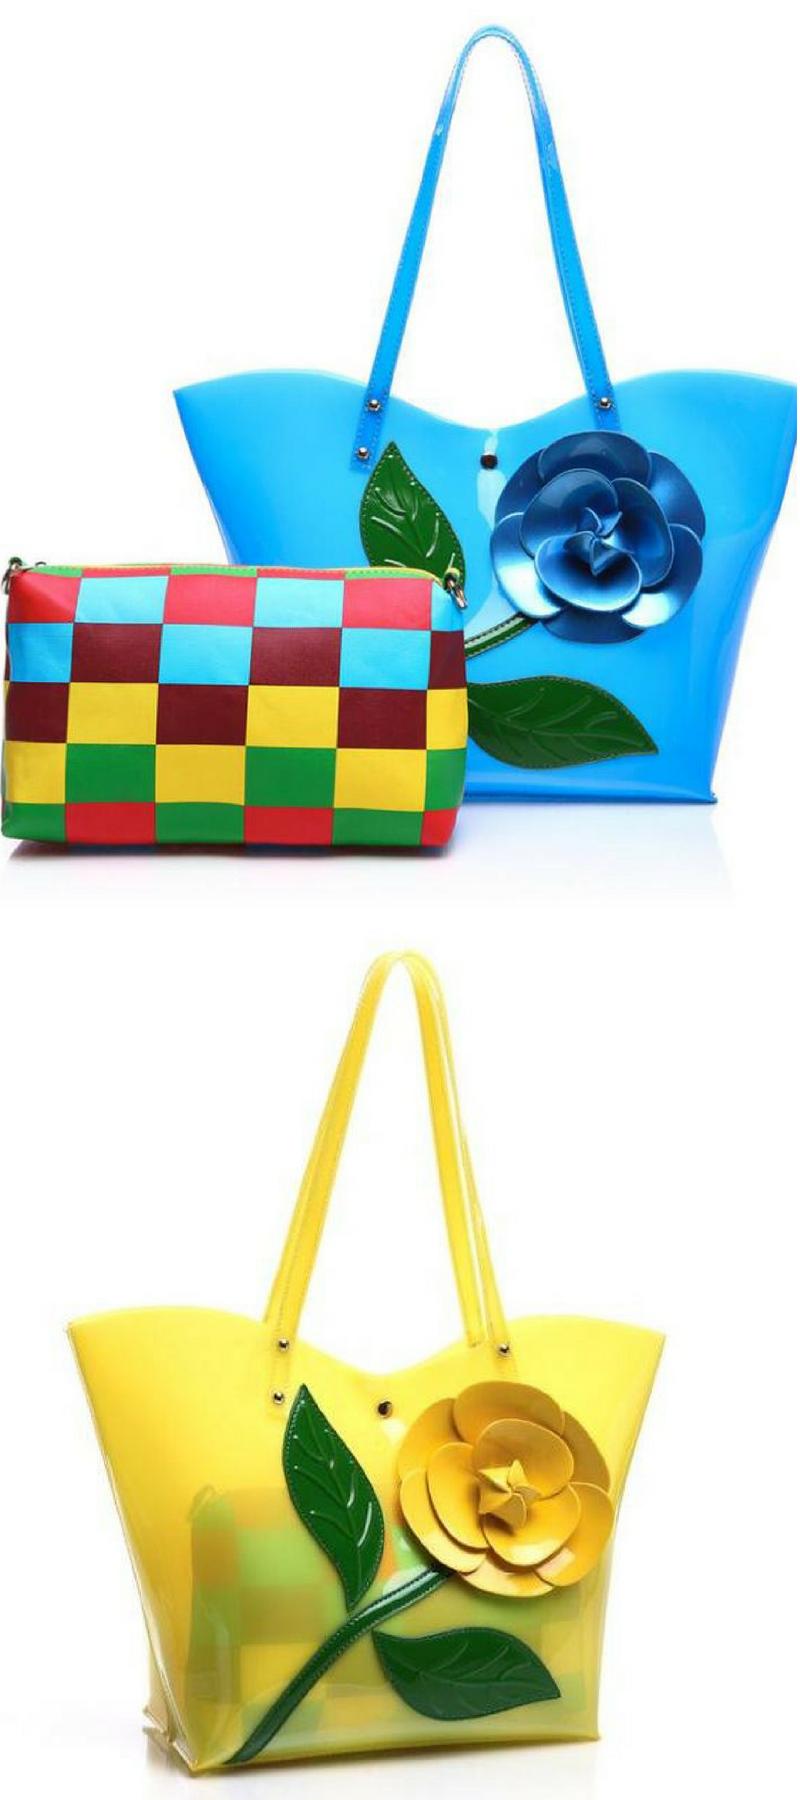 b3ffdac006c New 2018 Women Shoulder Bag Set High Quality PVC Handbags Luxury Flower  Beach Bag Famous Designer